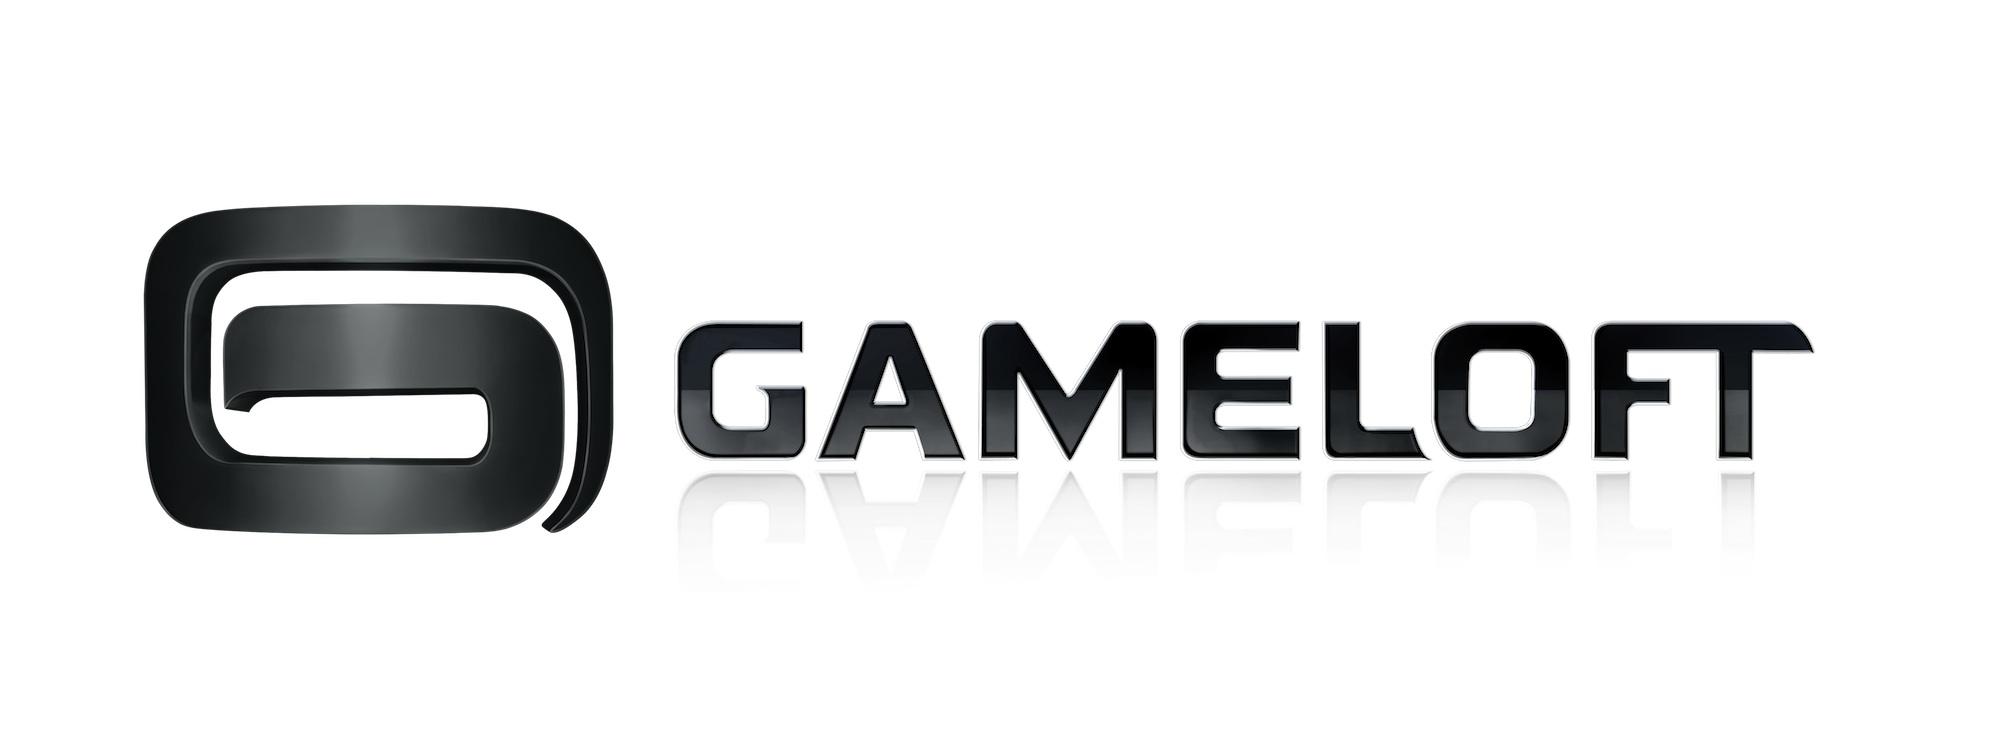 iSpazio intervista Yann Fourneau, Managing Director di Gameloft